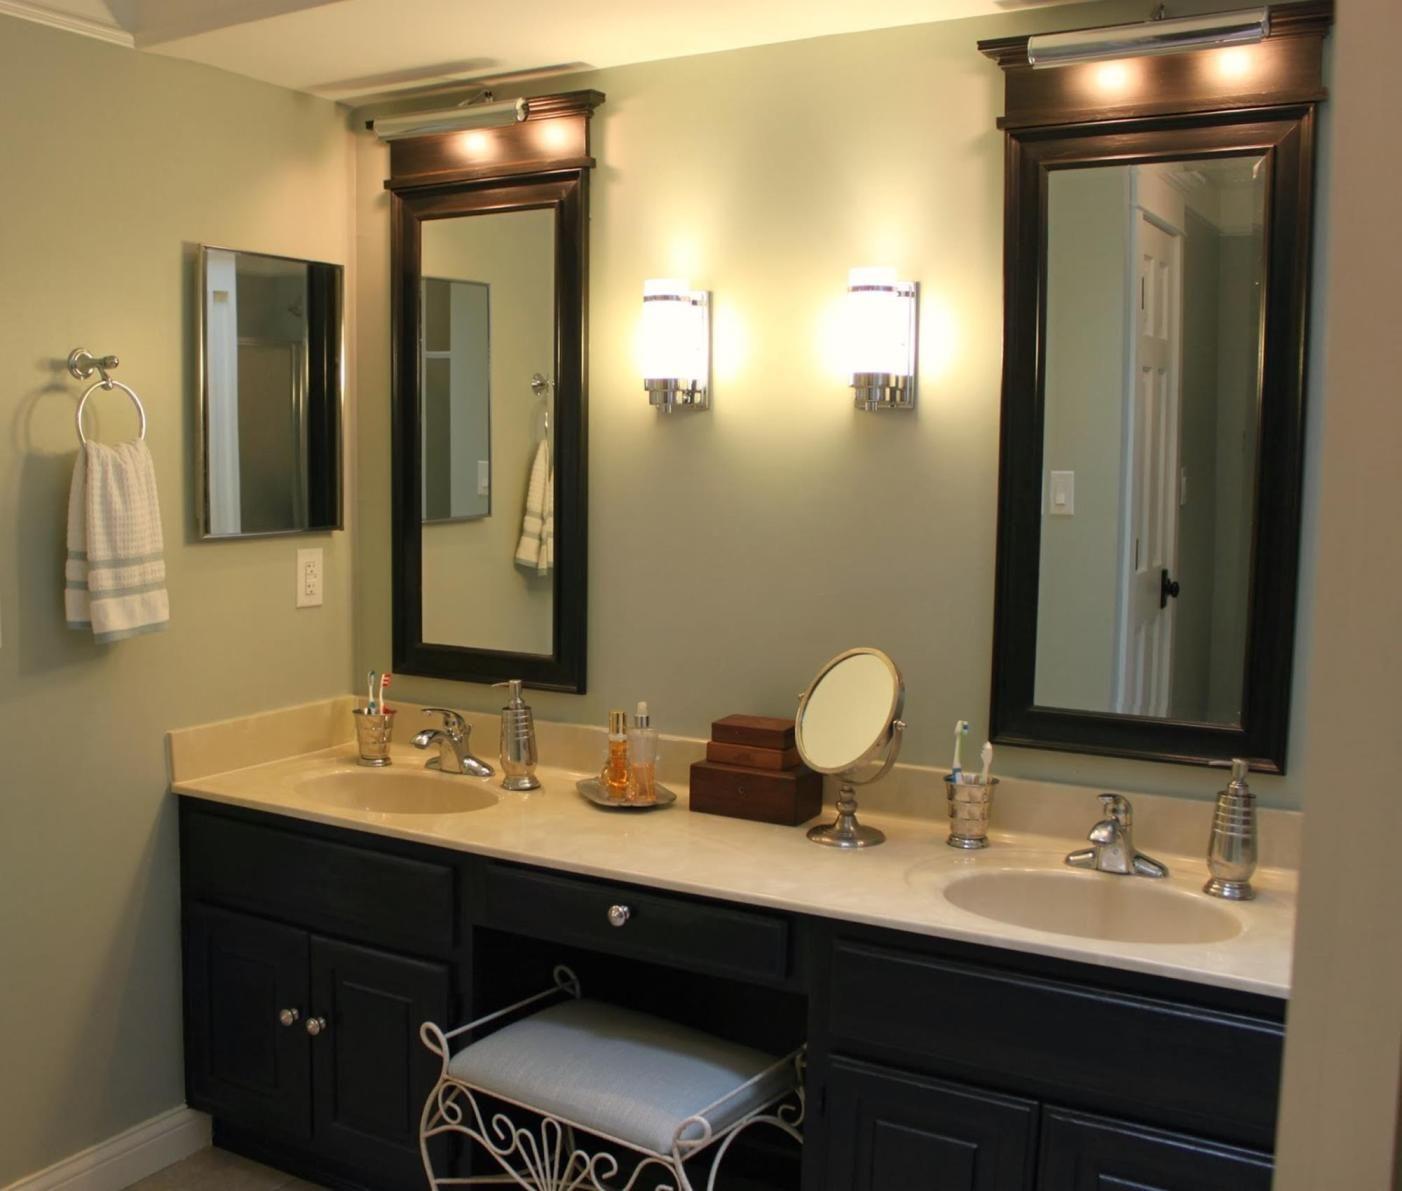 35 Stunning Bathroom Vanity Mirrors With Light Designs Beautiful Bathroom Vanity Modern Bathroom Light Fixtures Bathroom Sconce Lighting